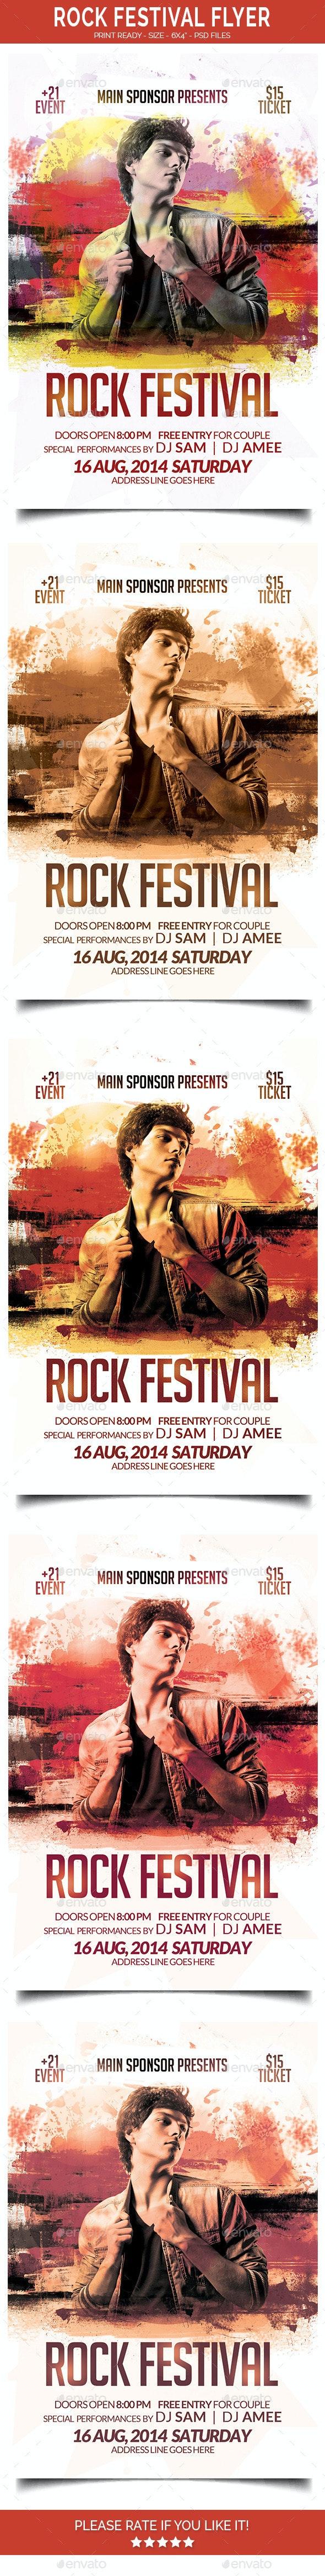 Rock Festival Flyer - Events Flyers